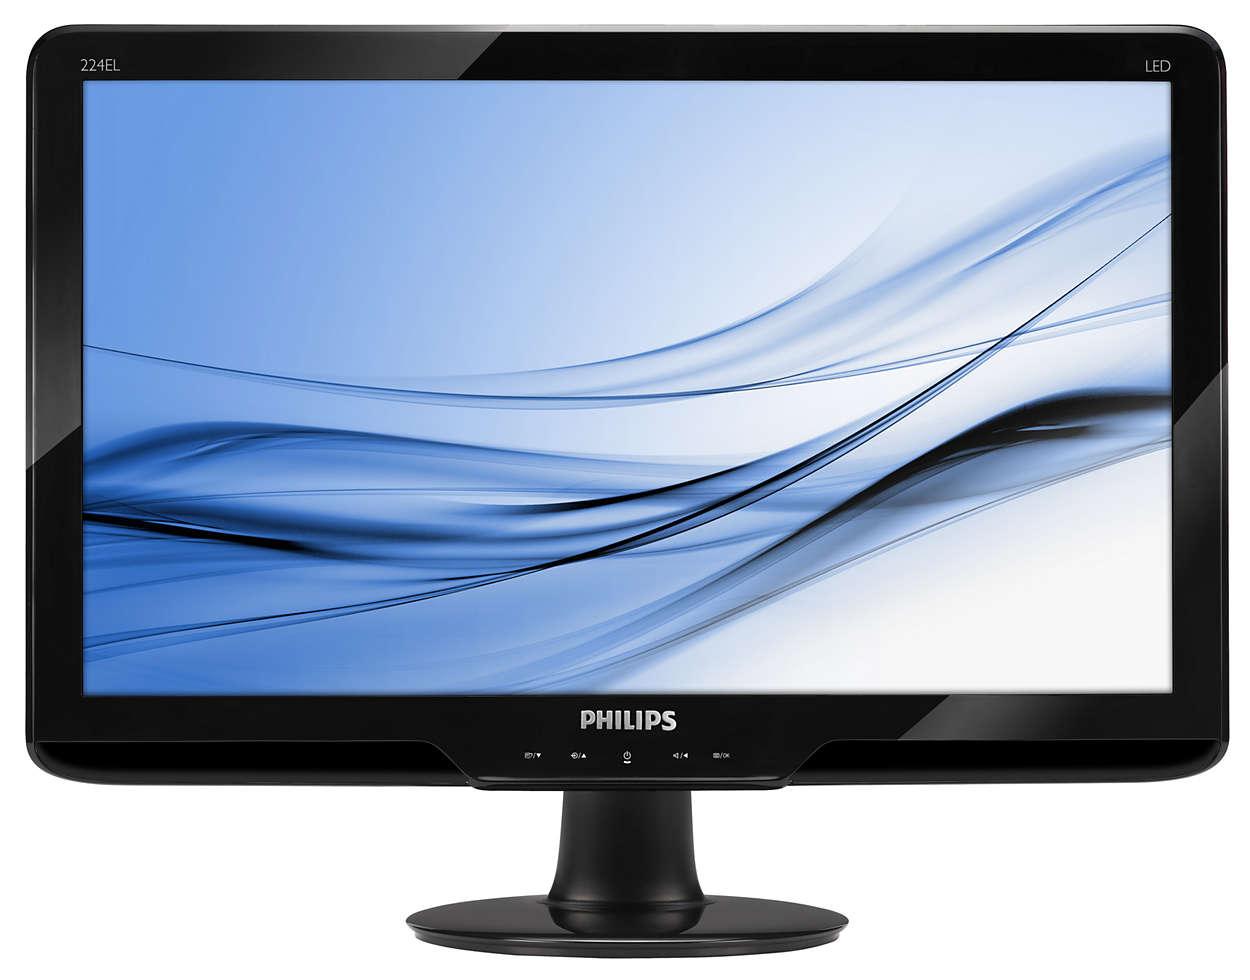 Eleganter HDMI-LED-Monitor für Unterhaltung in Full HD